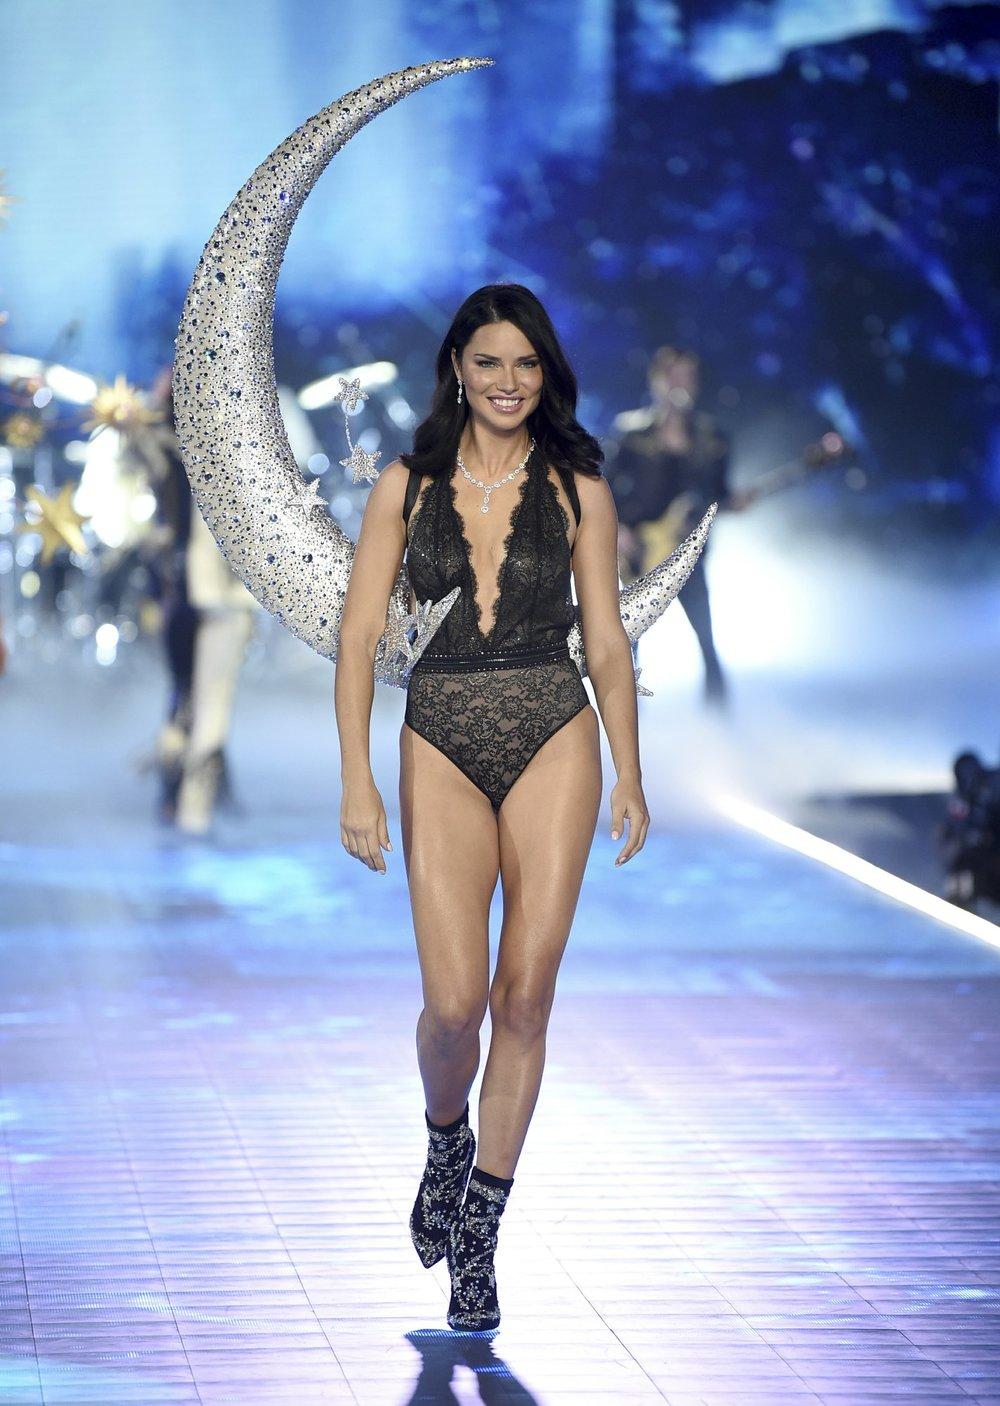 d7ffda3c633 Victoria s Secret angel Adriana Lima takes a final bow - The Standard